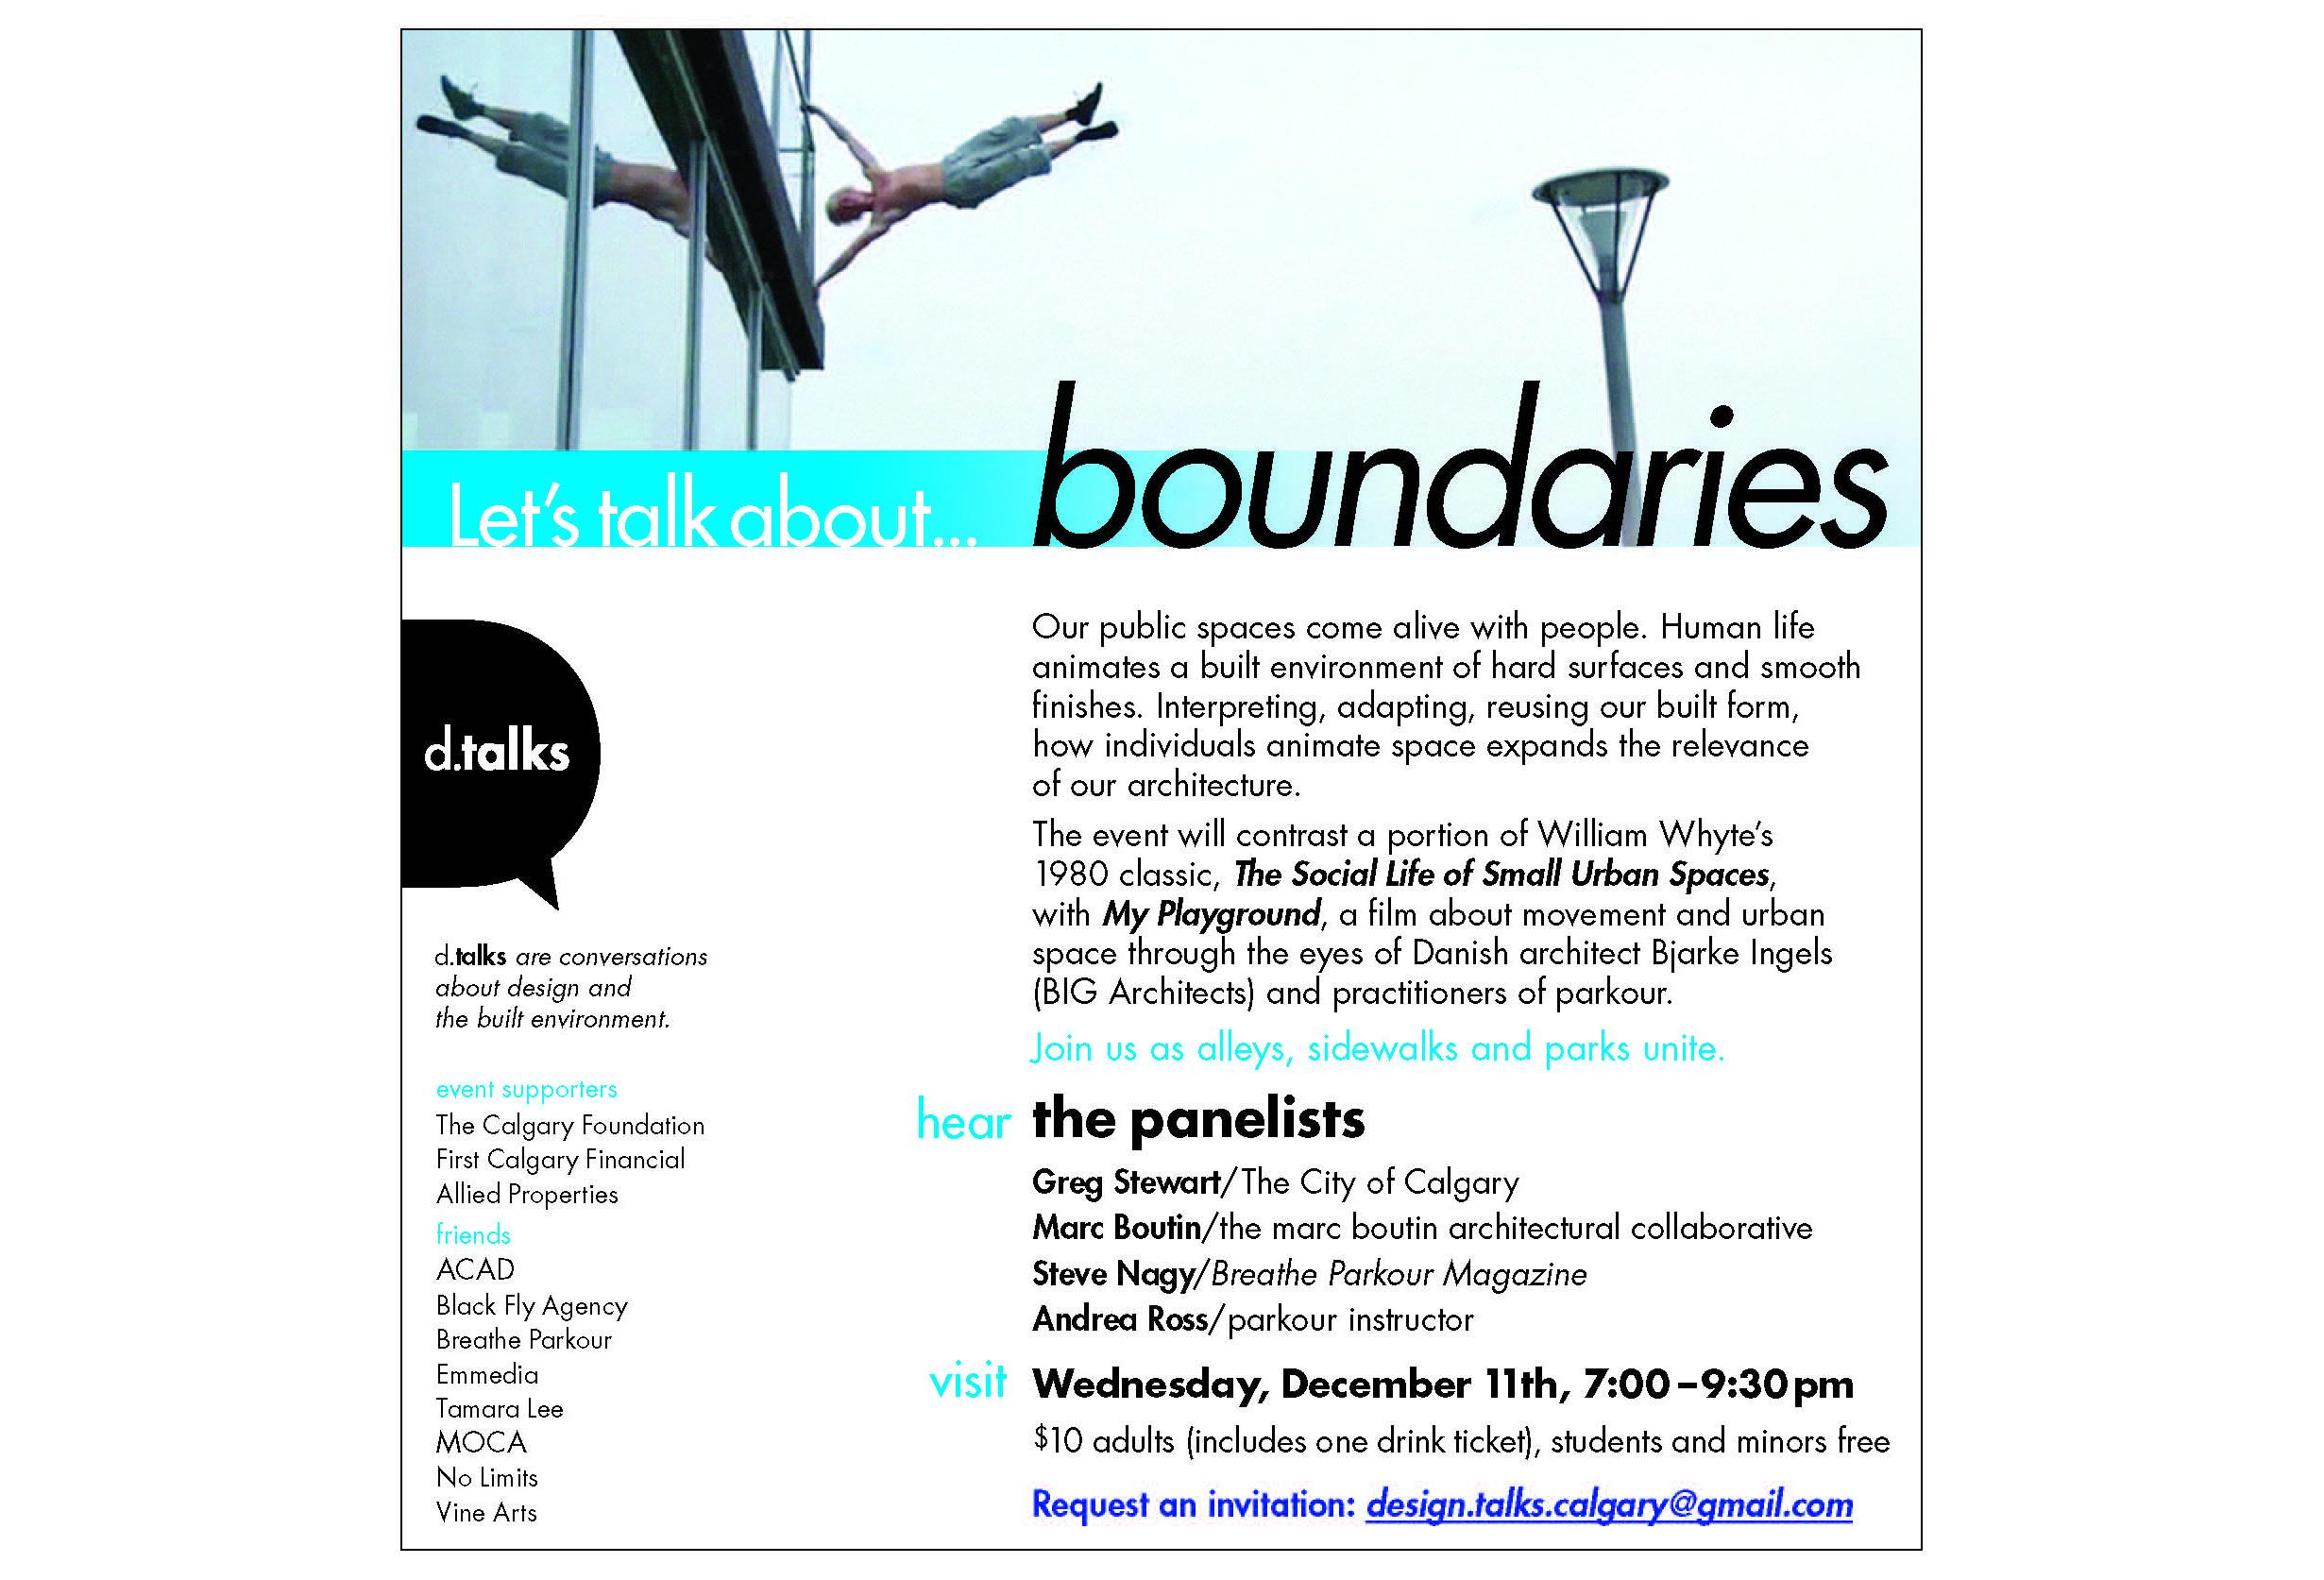 dt13_12-boundaries_InviteFB_REV_canvas.jpg